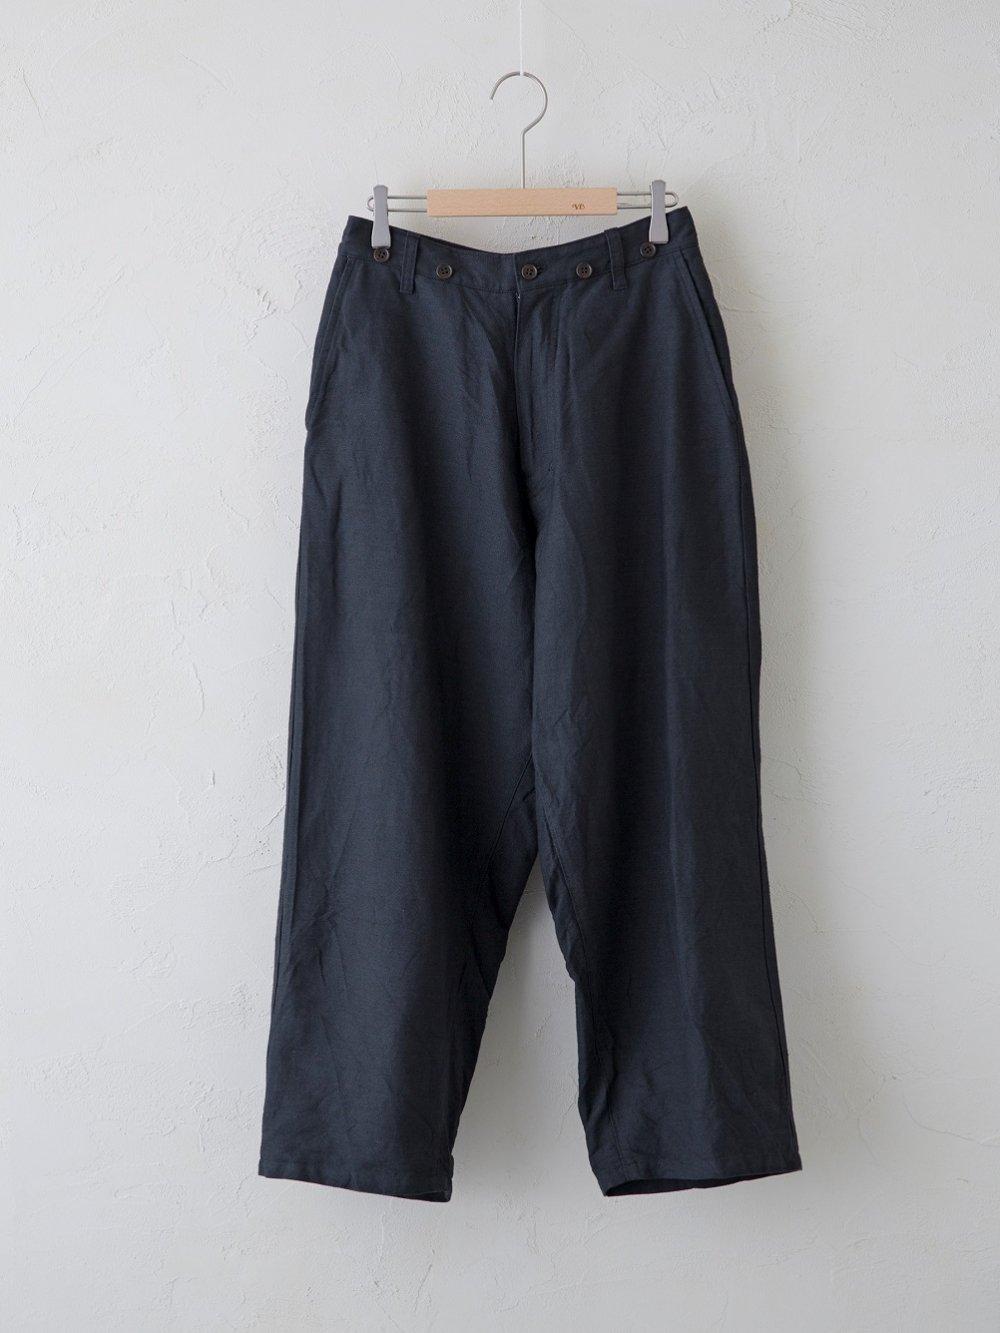 Cotton Linen ラチネ パンツ(Ladies' & Men's)